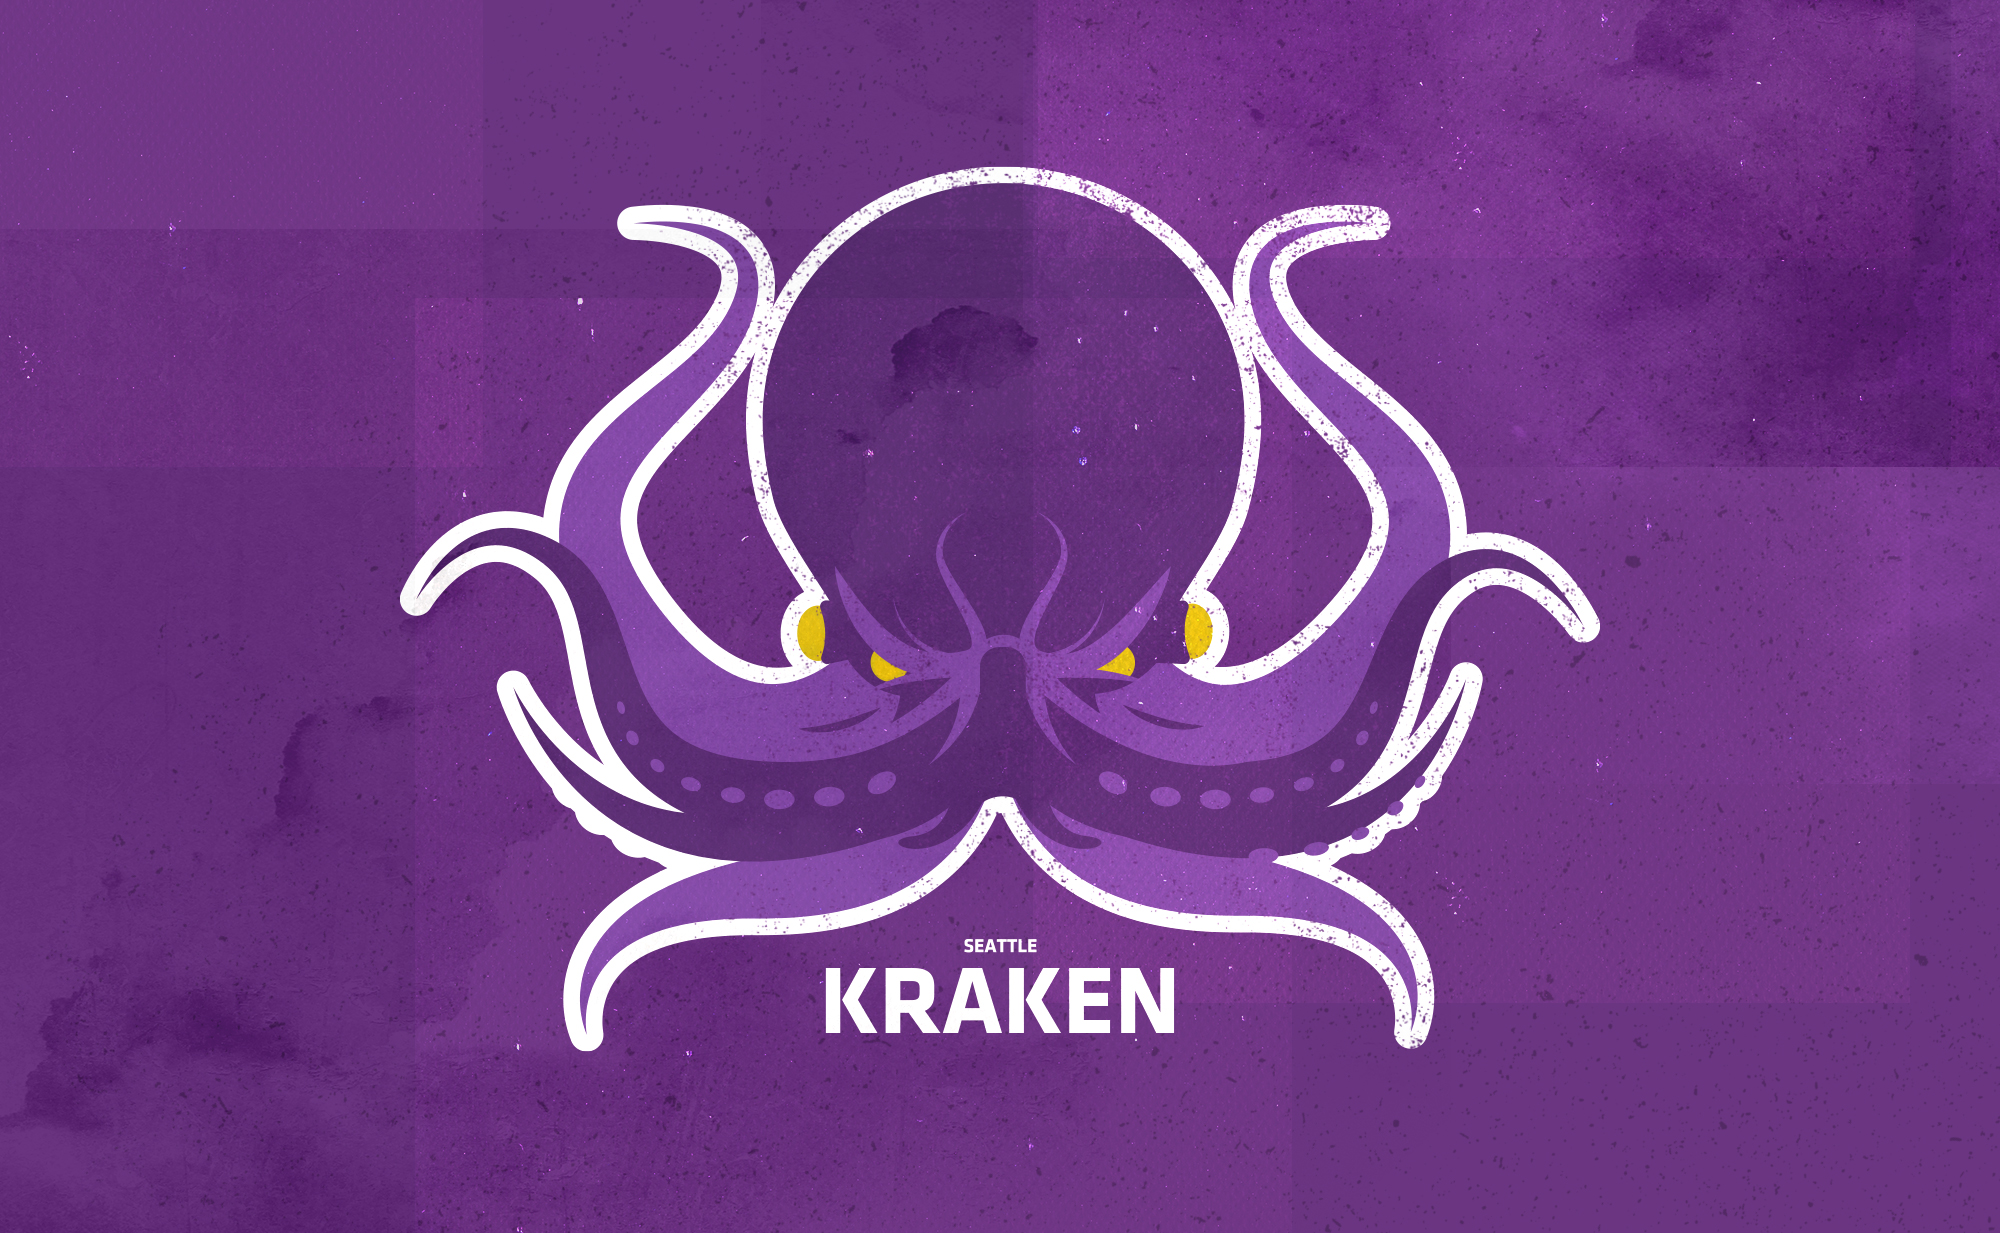 logo of a large purple octopus like sea monster